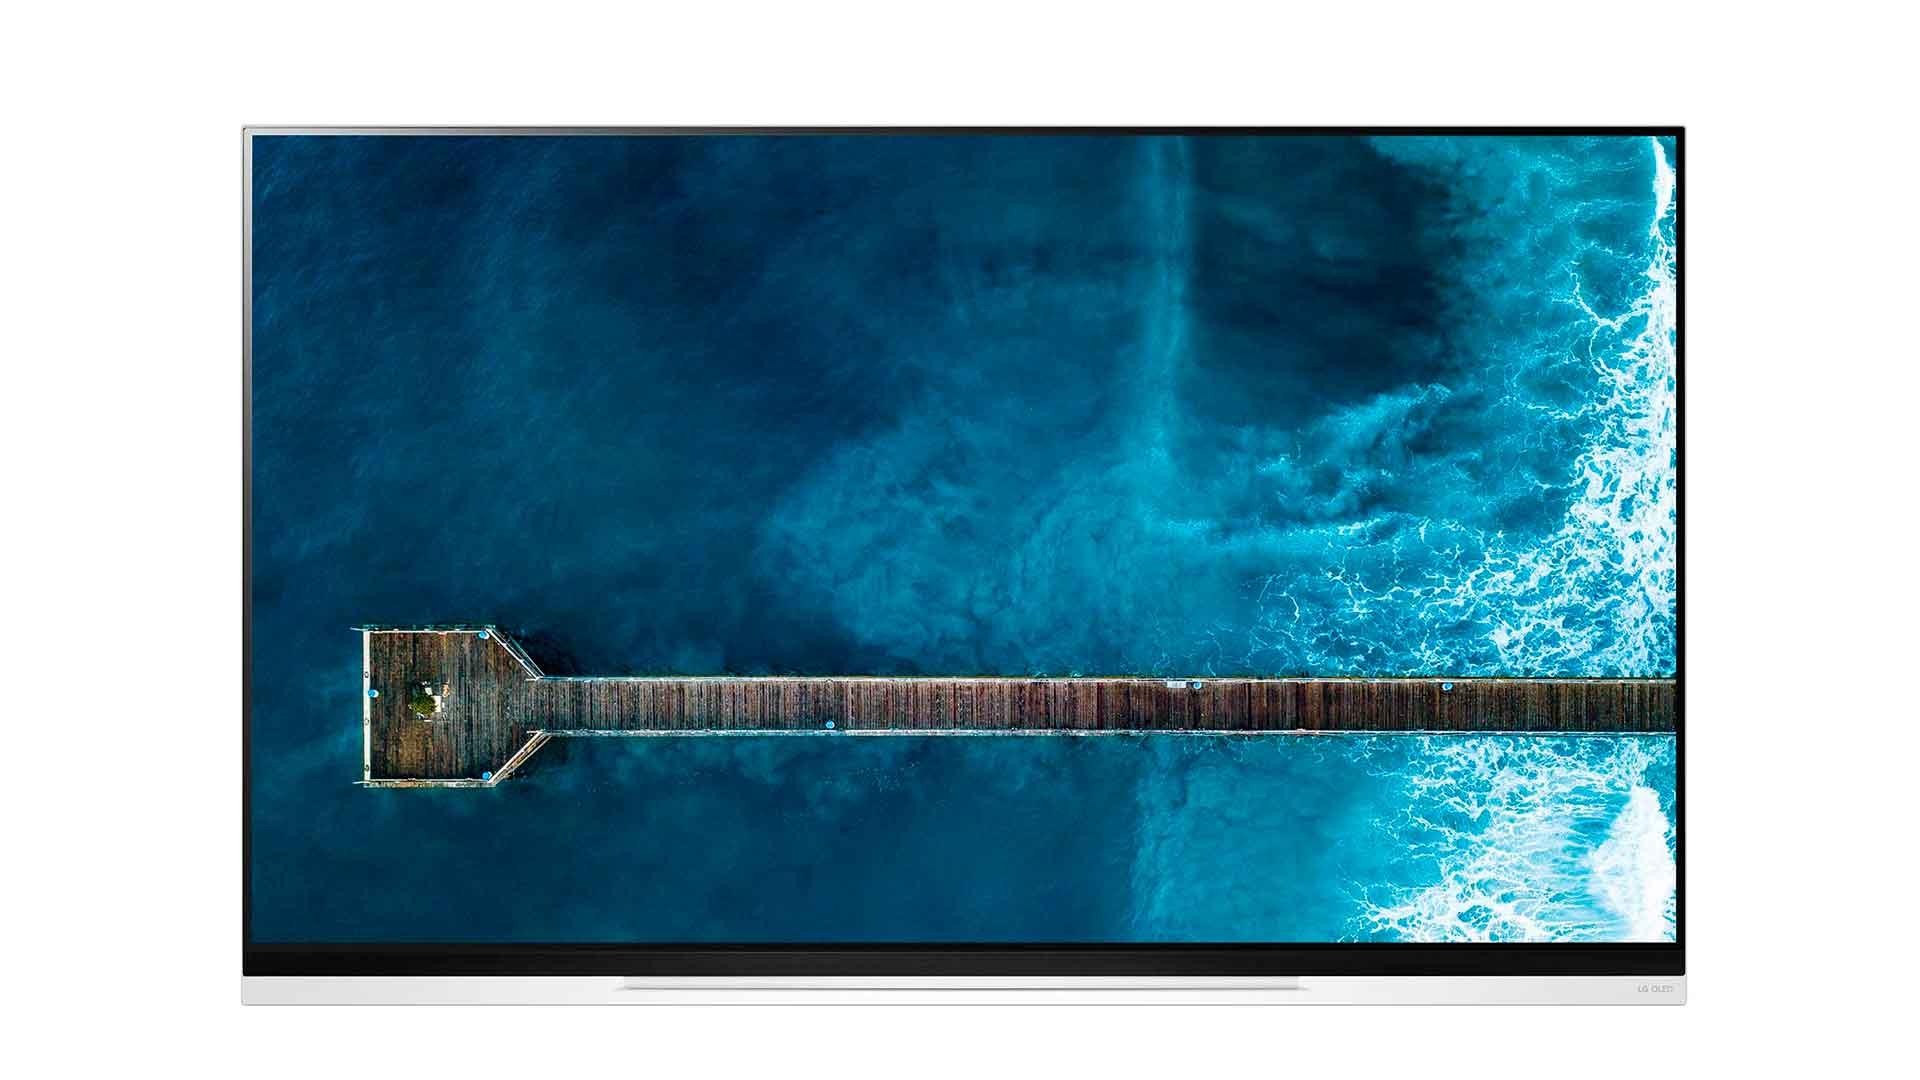 LG OLED TV: tecnología incomparable